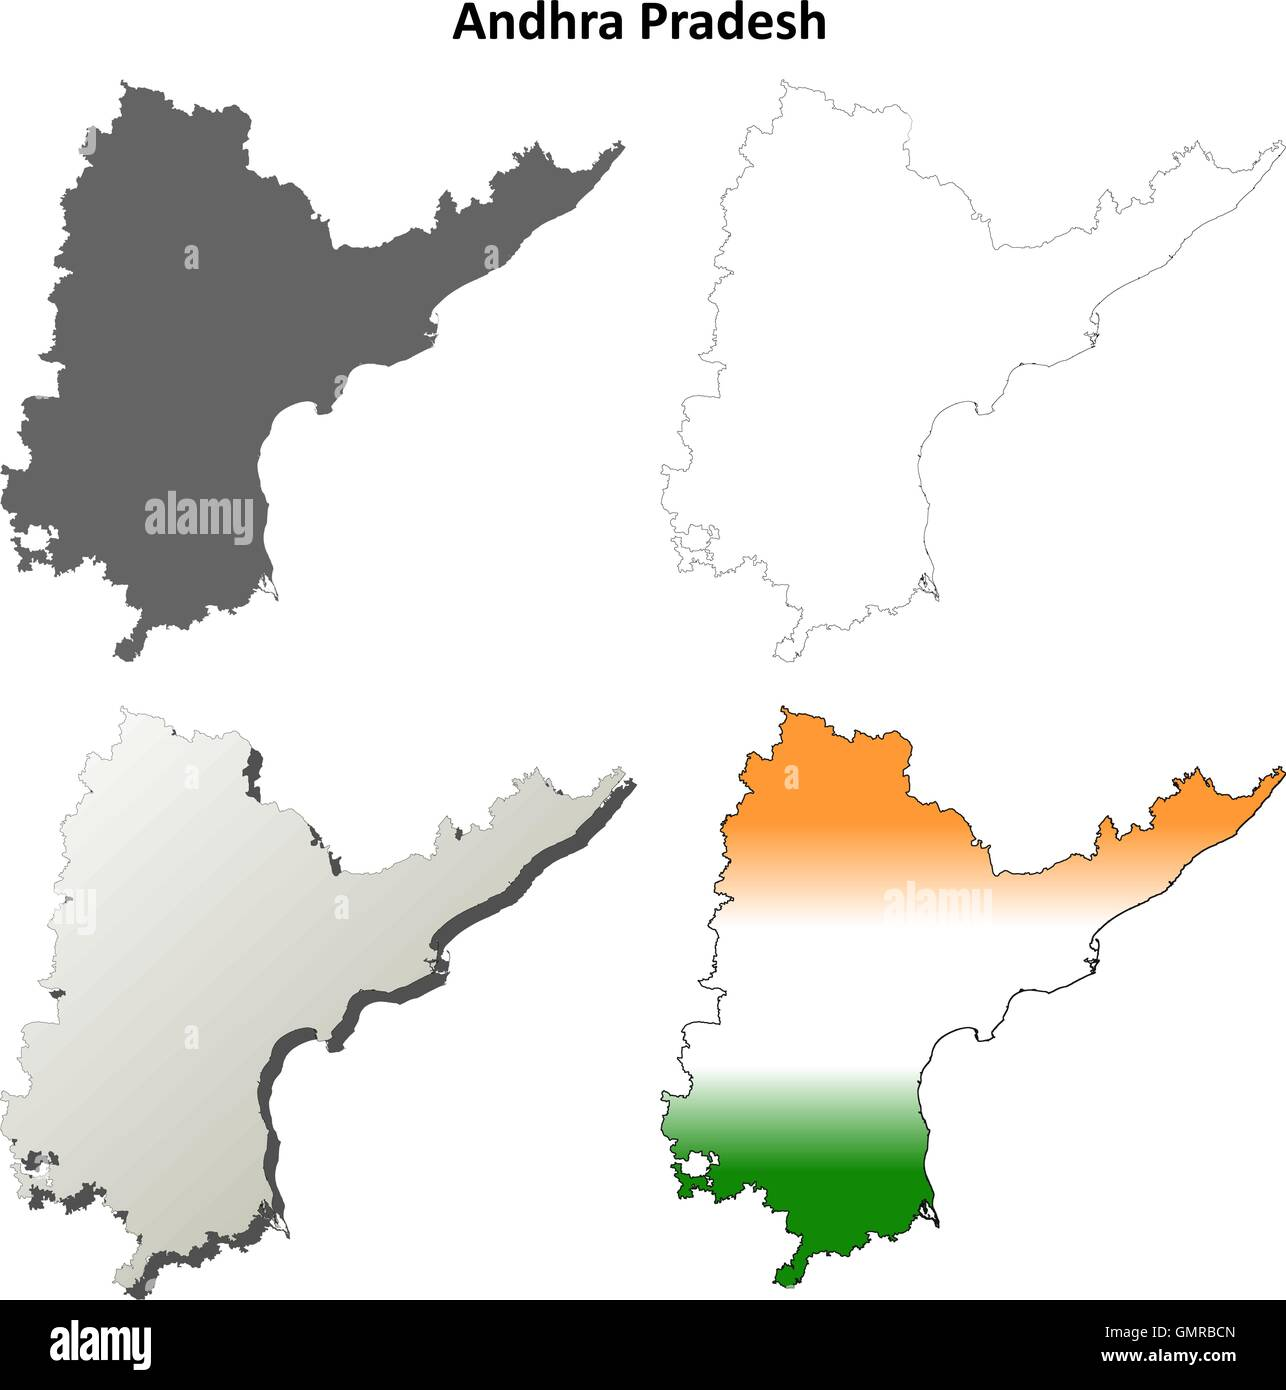 Andhra Pradesh blank outline map set Stock Vector Art & Illustration ...